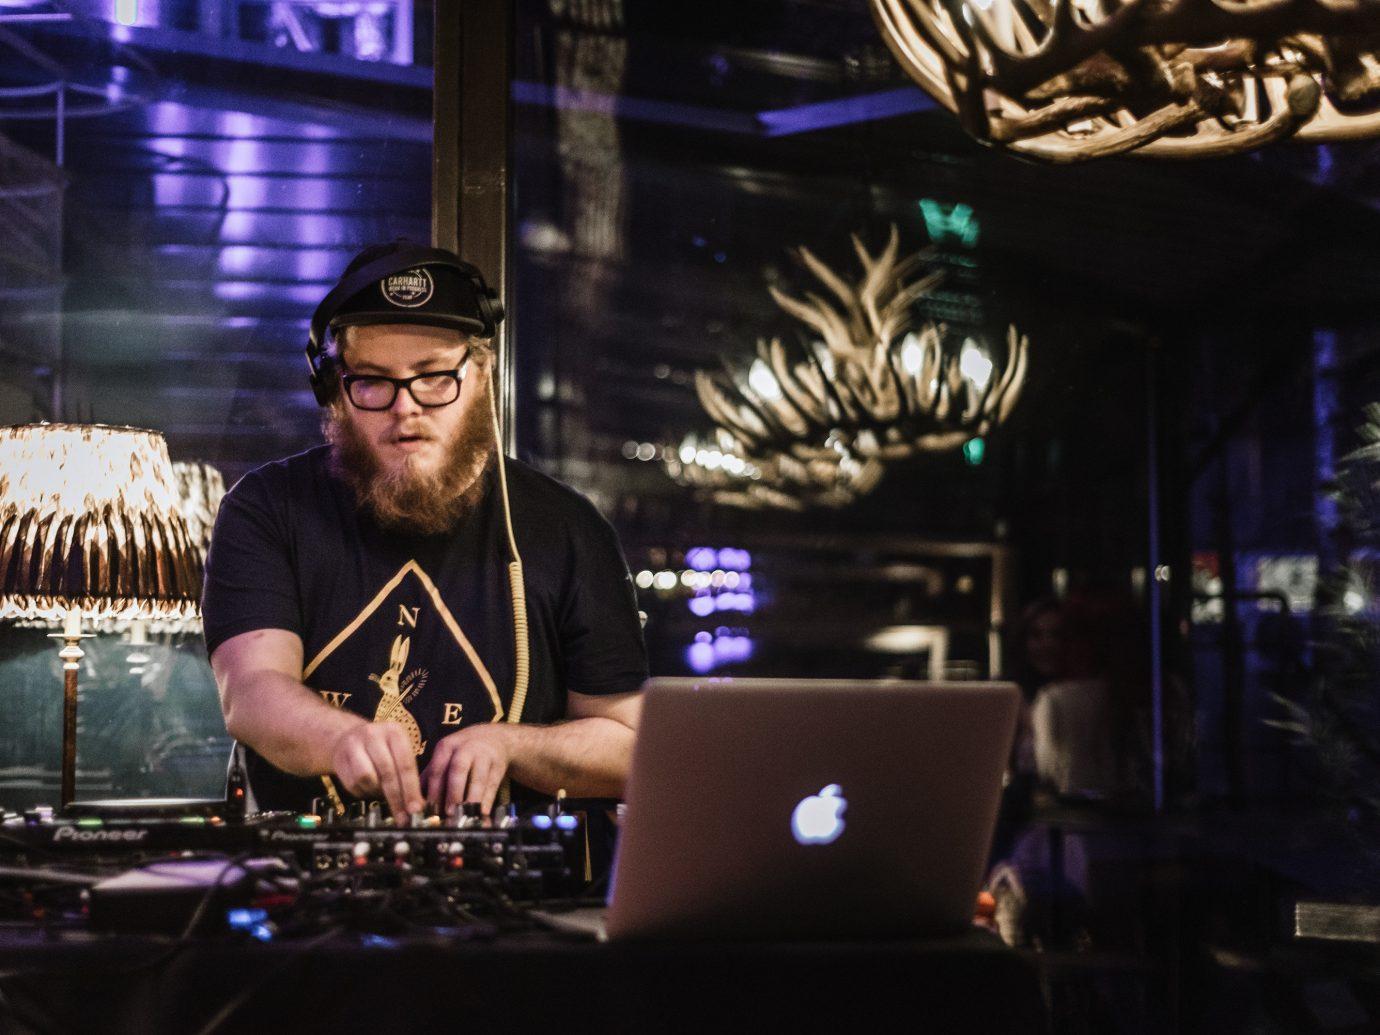 Trip Ideas person indoor laptop performance musician Music disc jockey Entertainment stage concert nightclub drummer